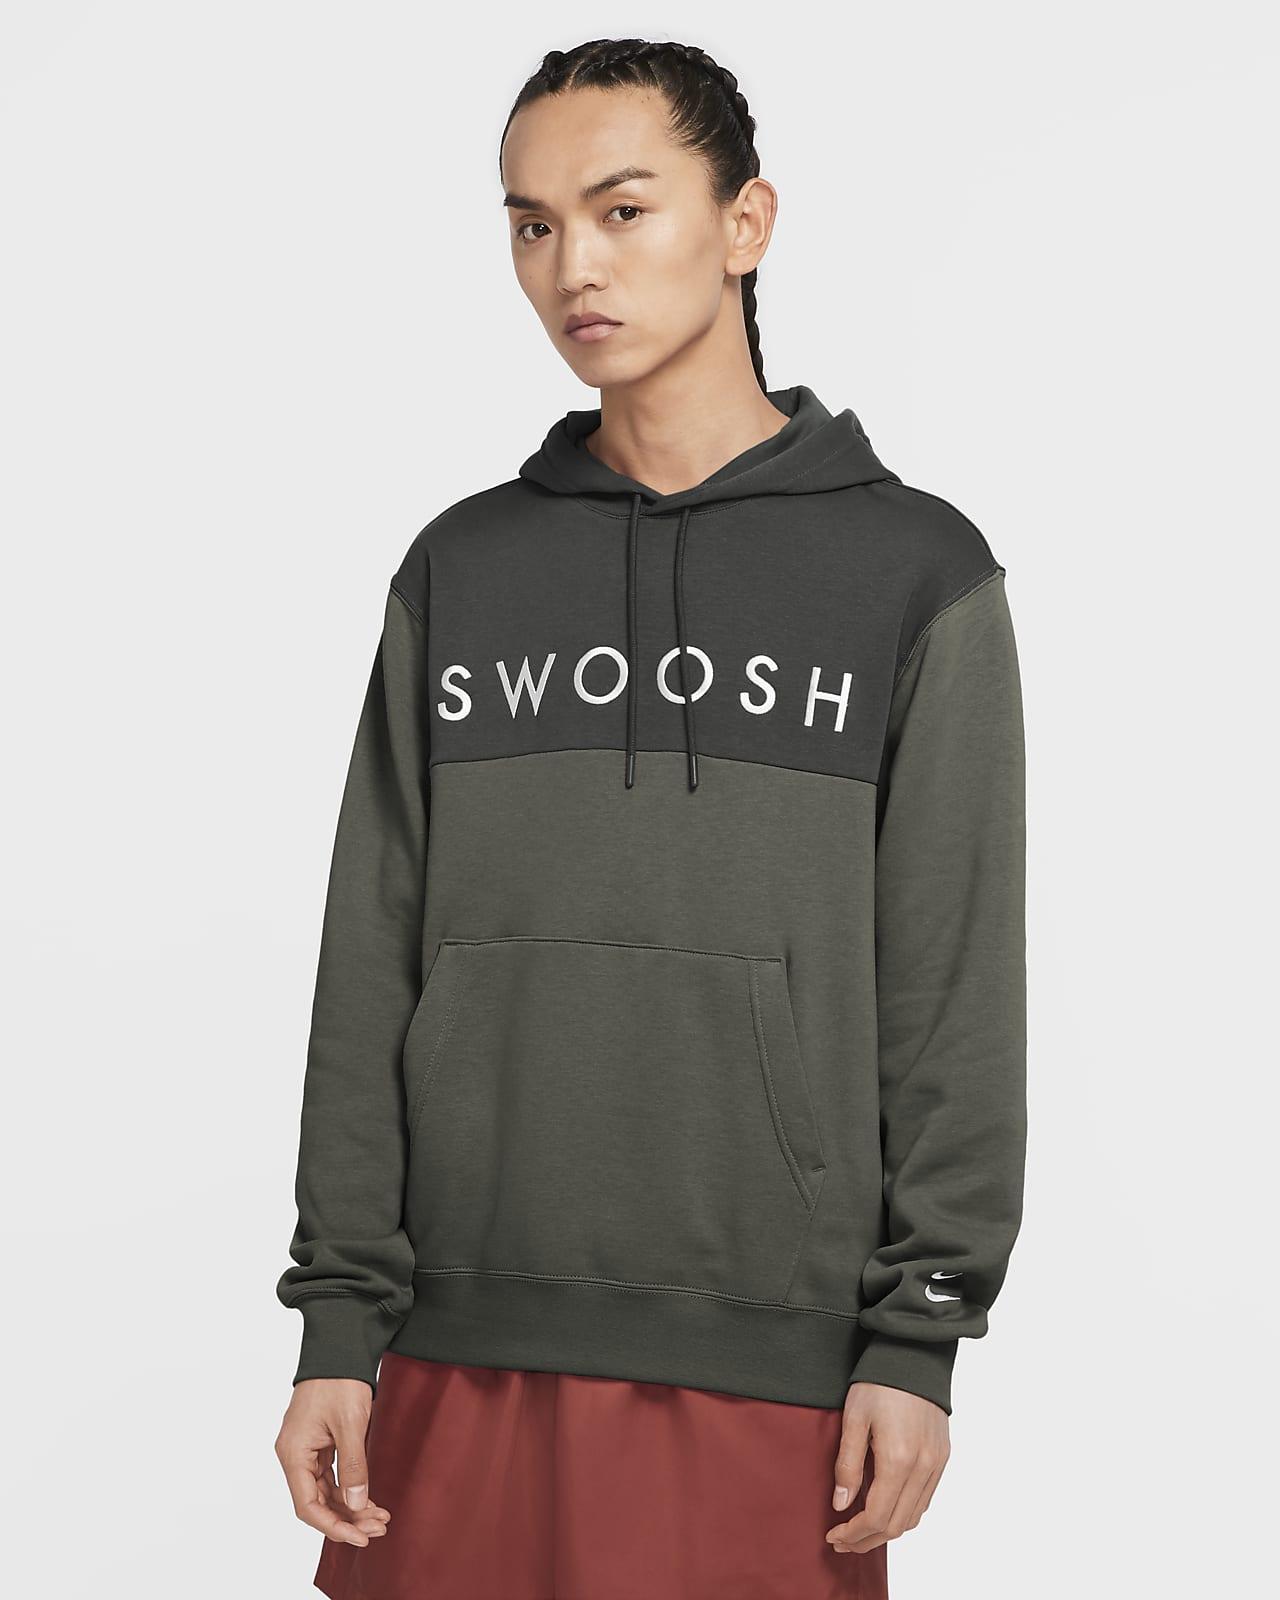 Huvtröja Nike Sportswear Swoosh för män